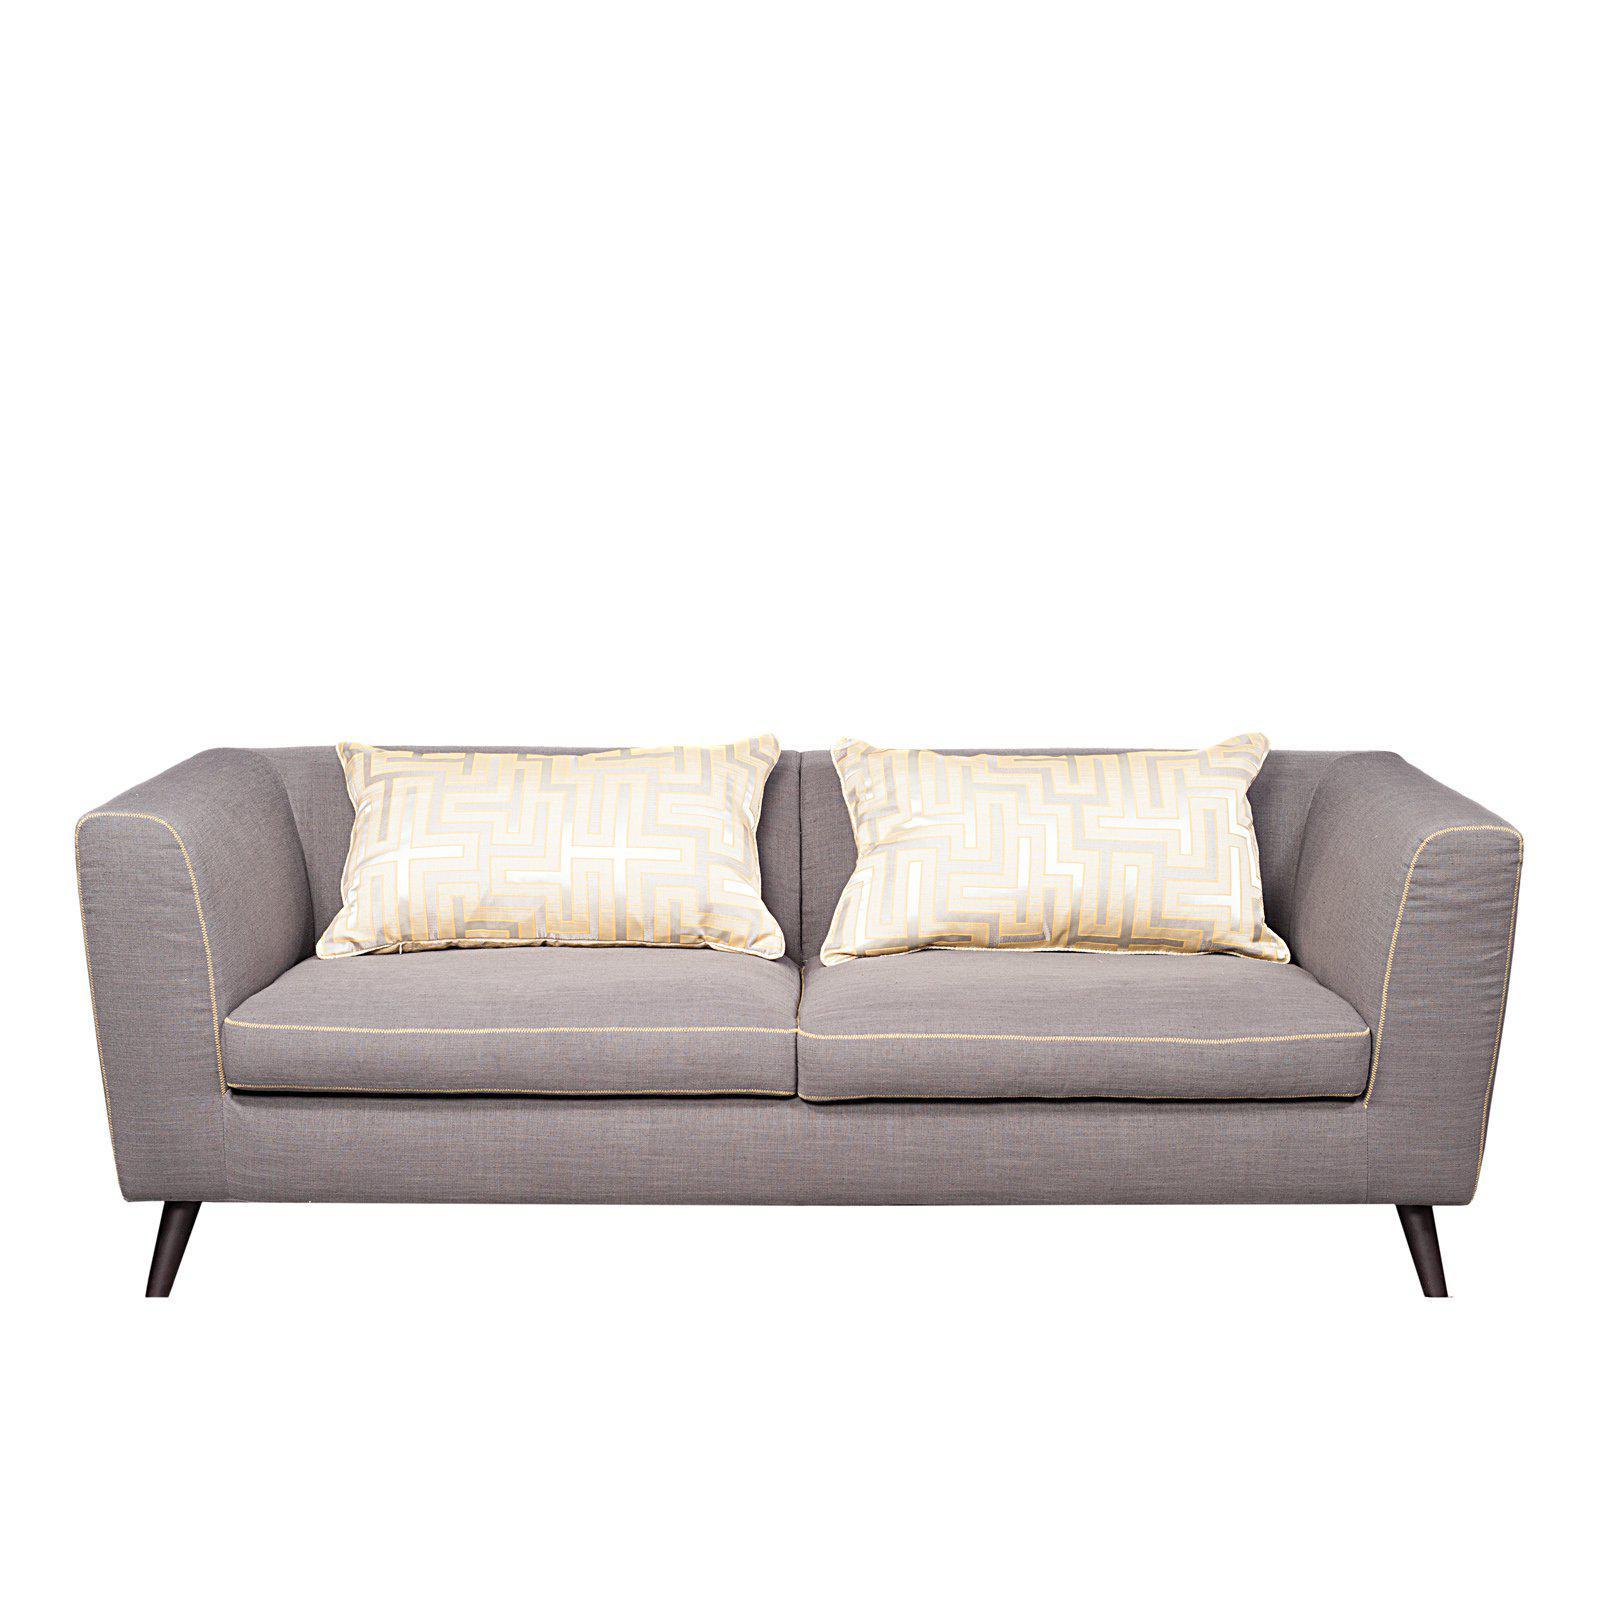 modern gray sofa set turkish bed marvin